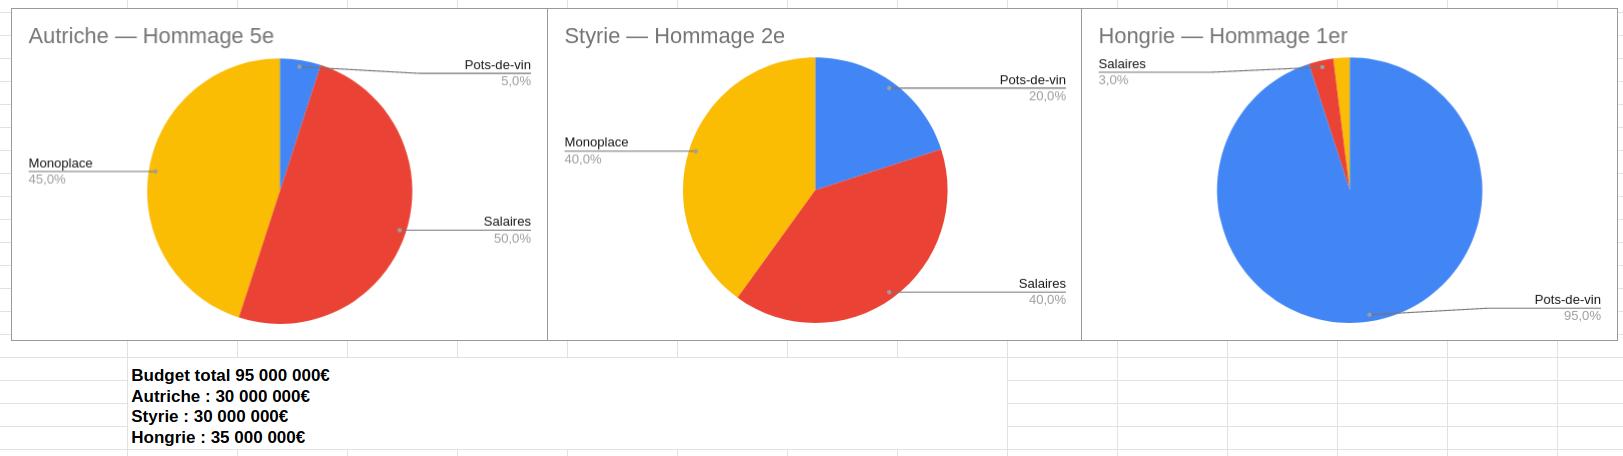 [FMWC] Topic du championnat 2020 - Page 6 Screen32